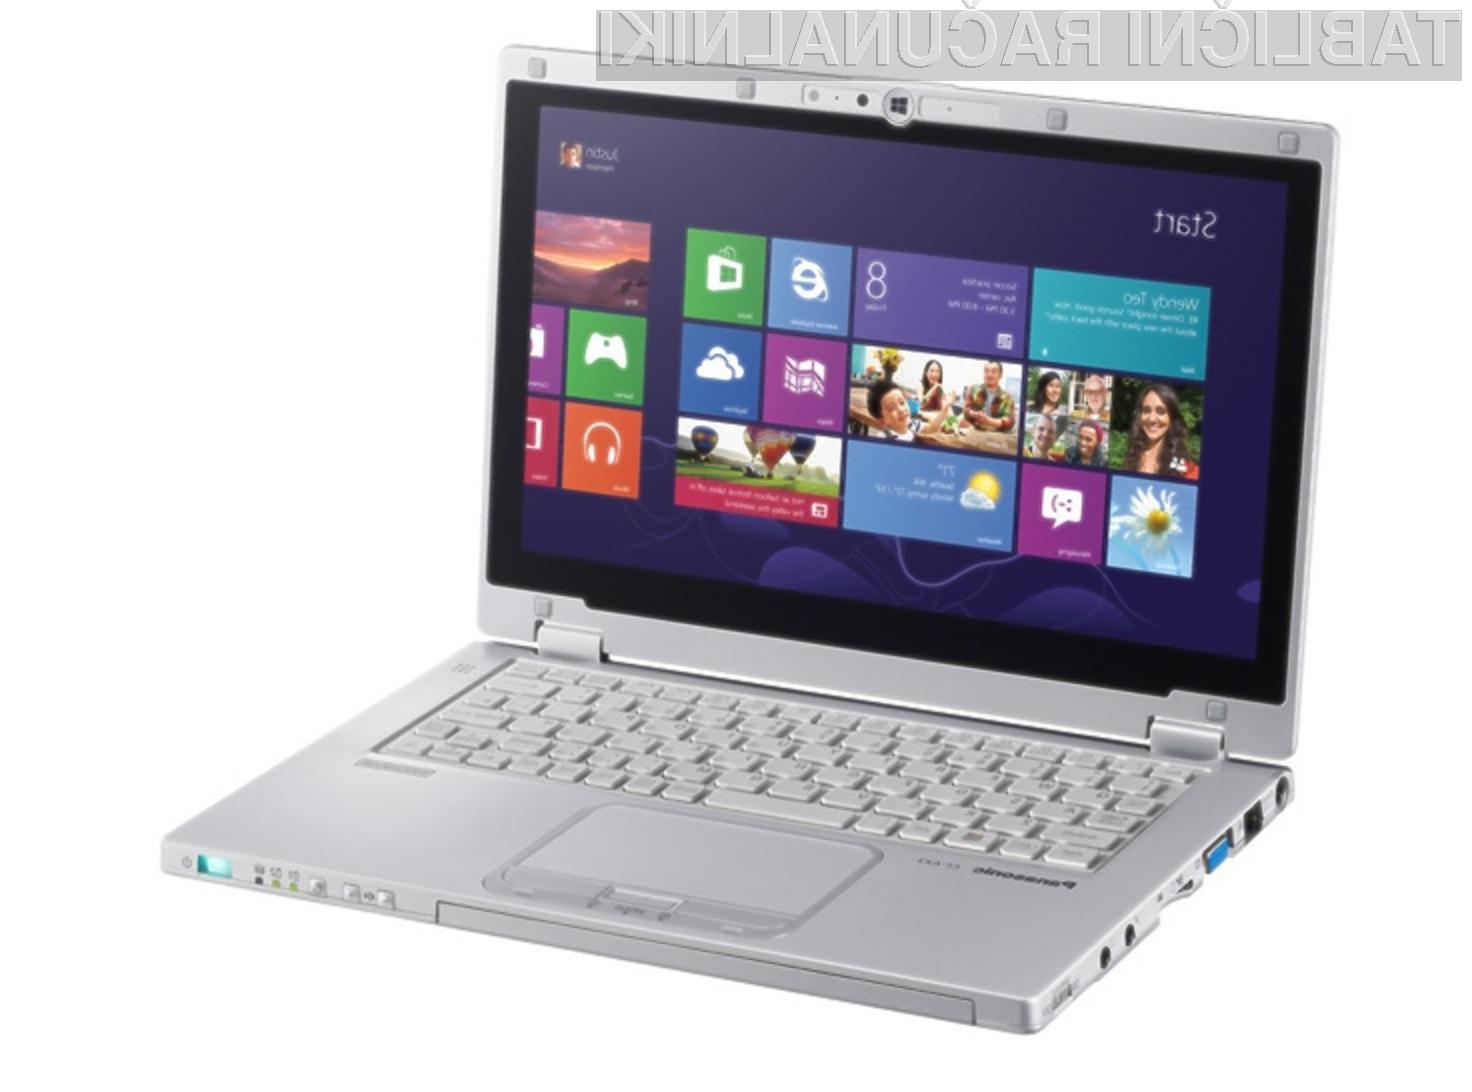 Ultrabook Panasonic Toughbook CF-AX2 bomo le stežka uničili!